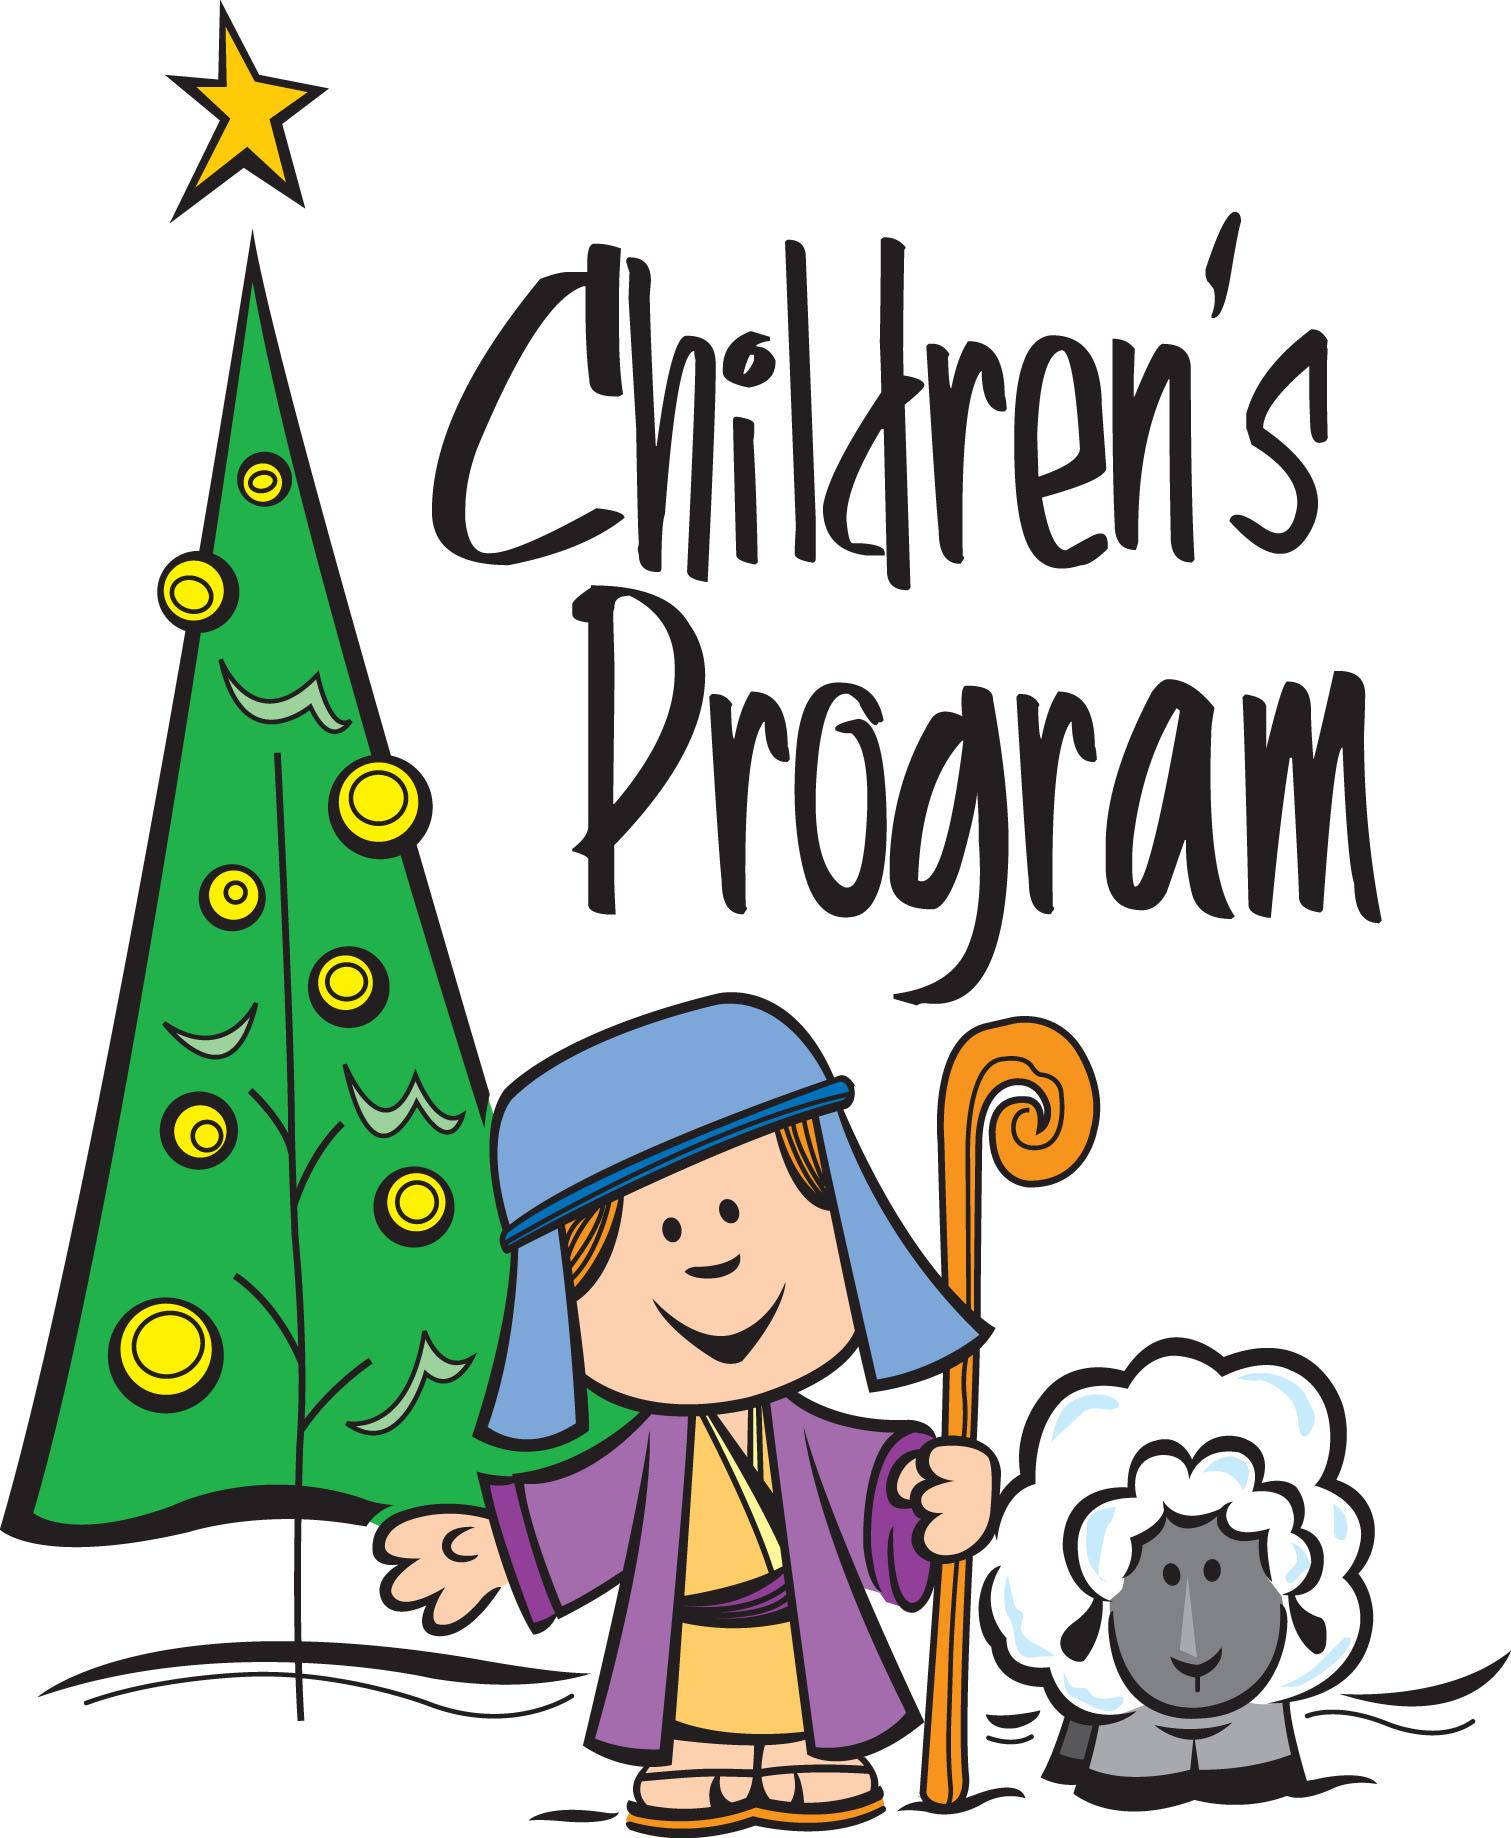 Advent free download best. Caroling clipart christmas program